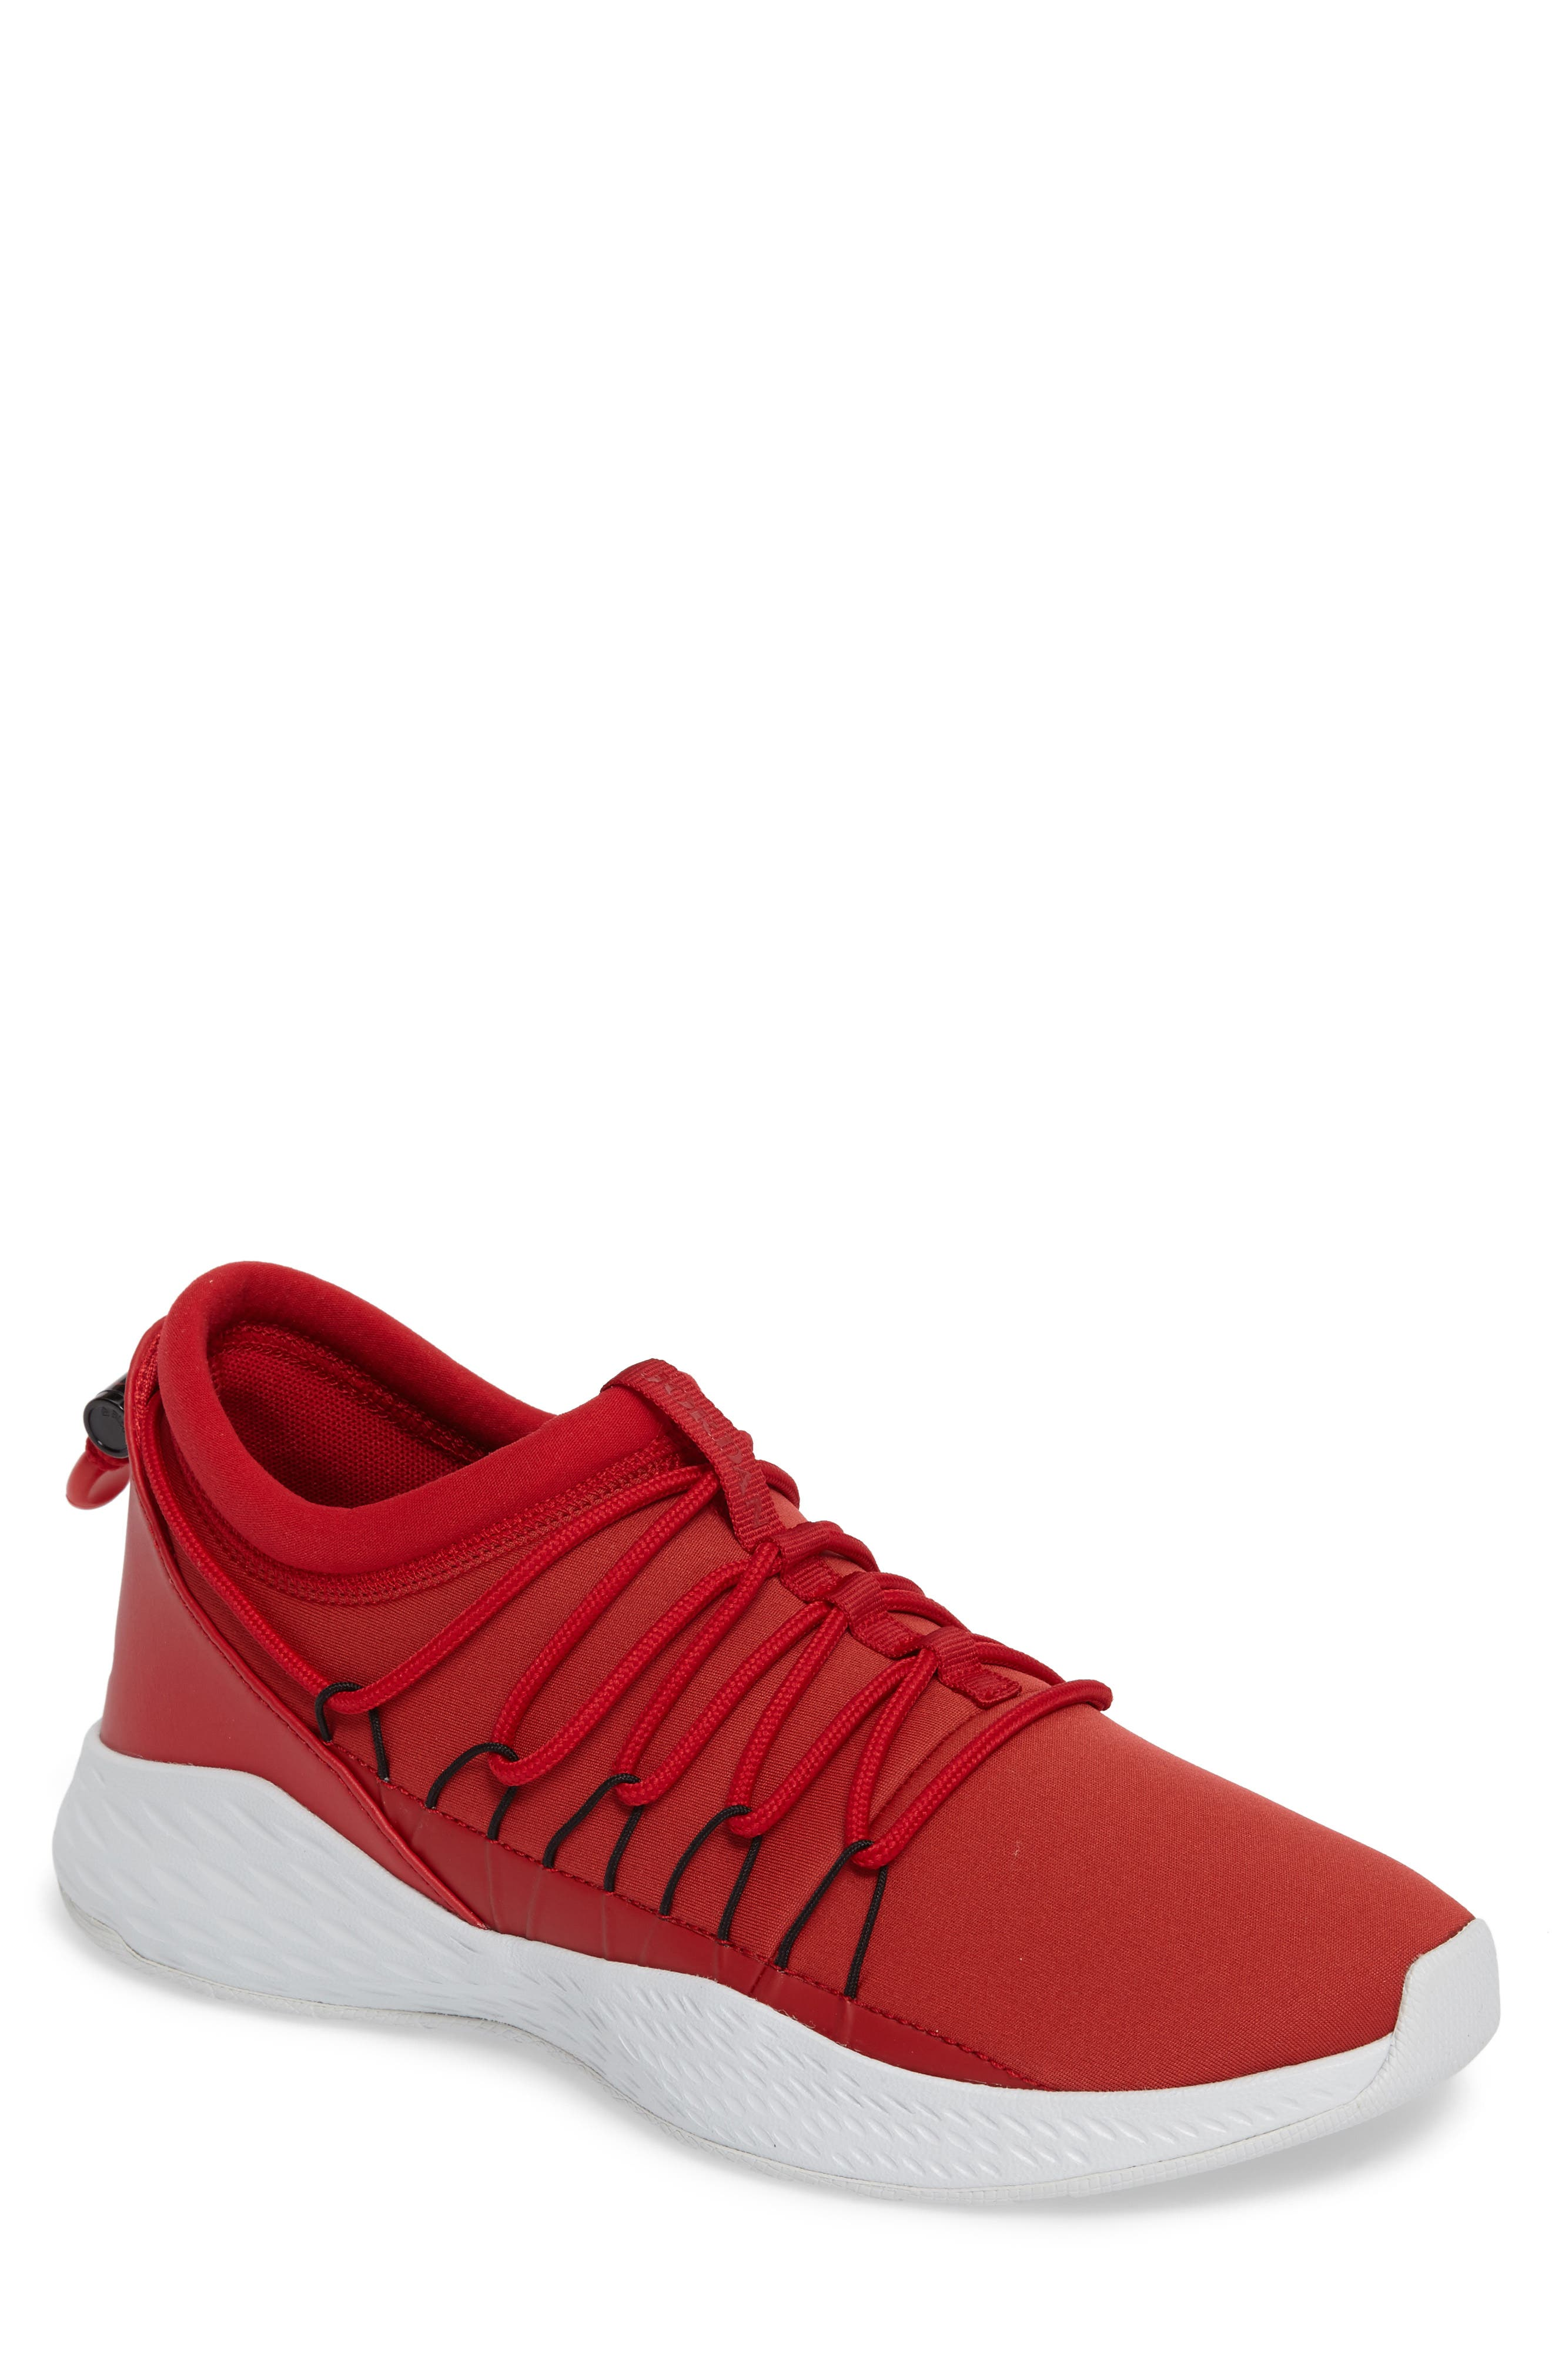 Nike Jordan Formula 23 Toggle Basketball Shoe (Men)